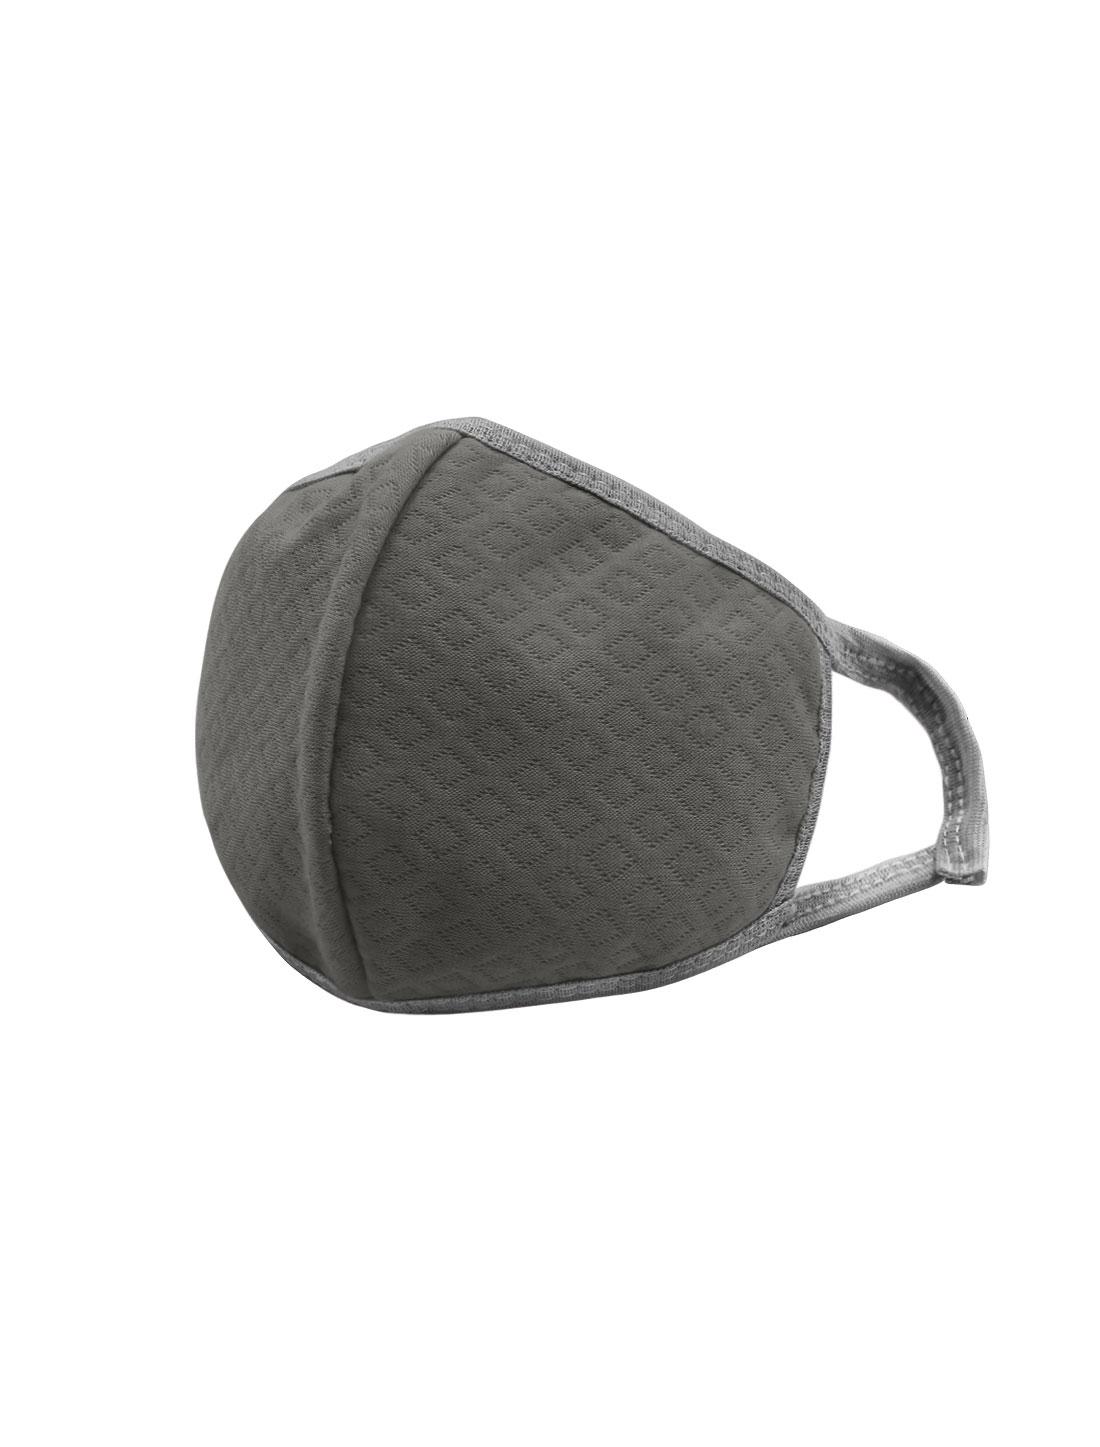 Unisex Elastic Earloops Argyle Design Anti-dust Mouth Mask Gray